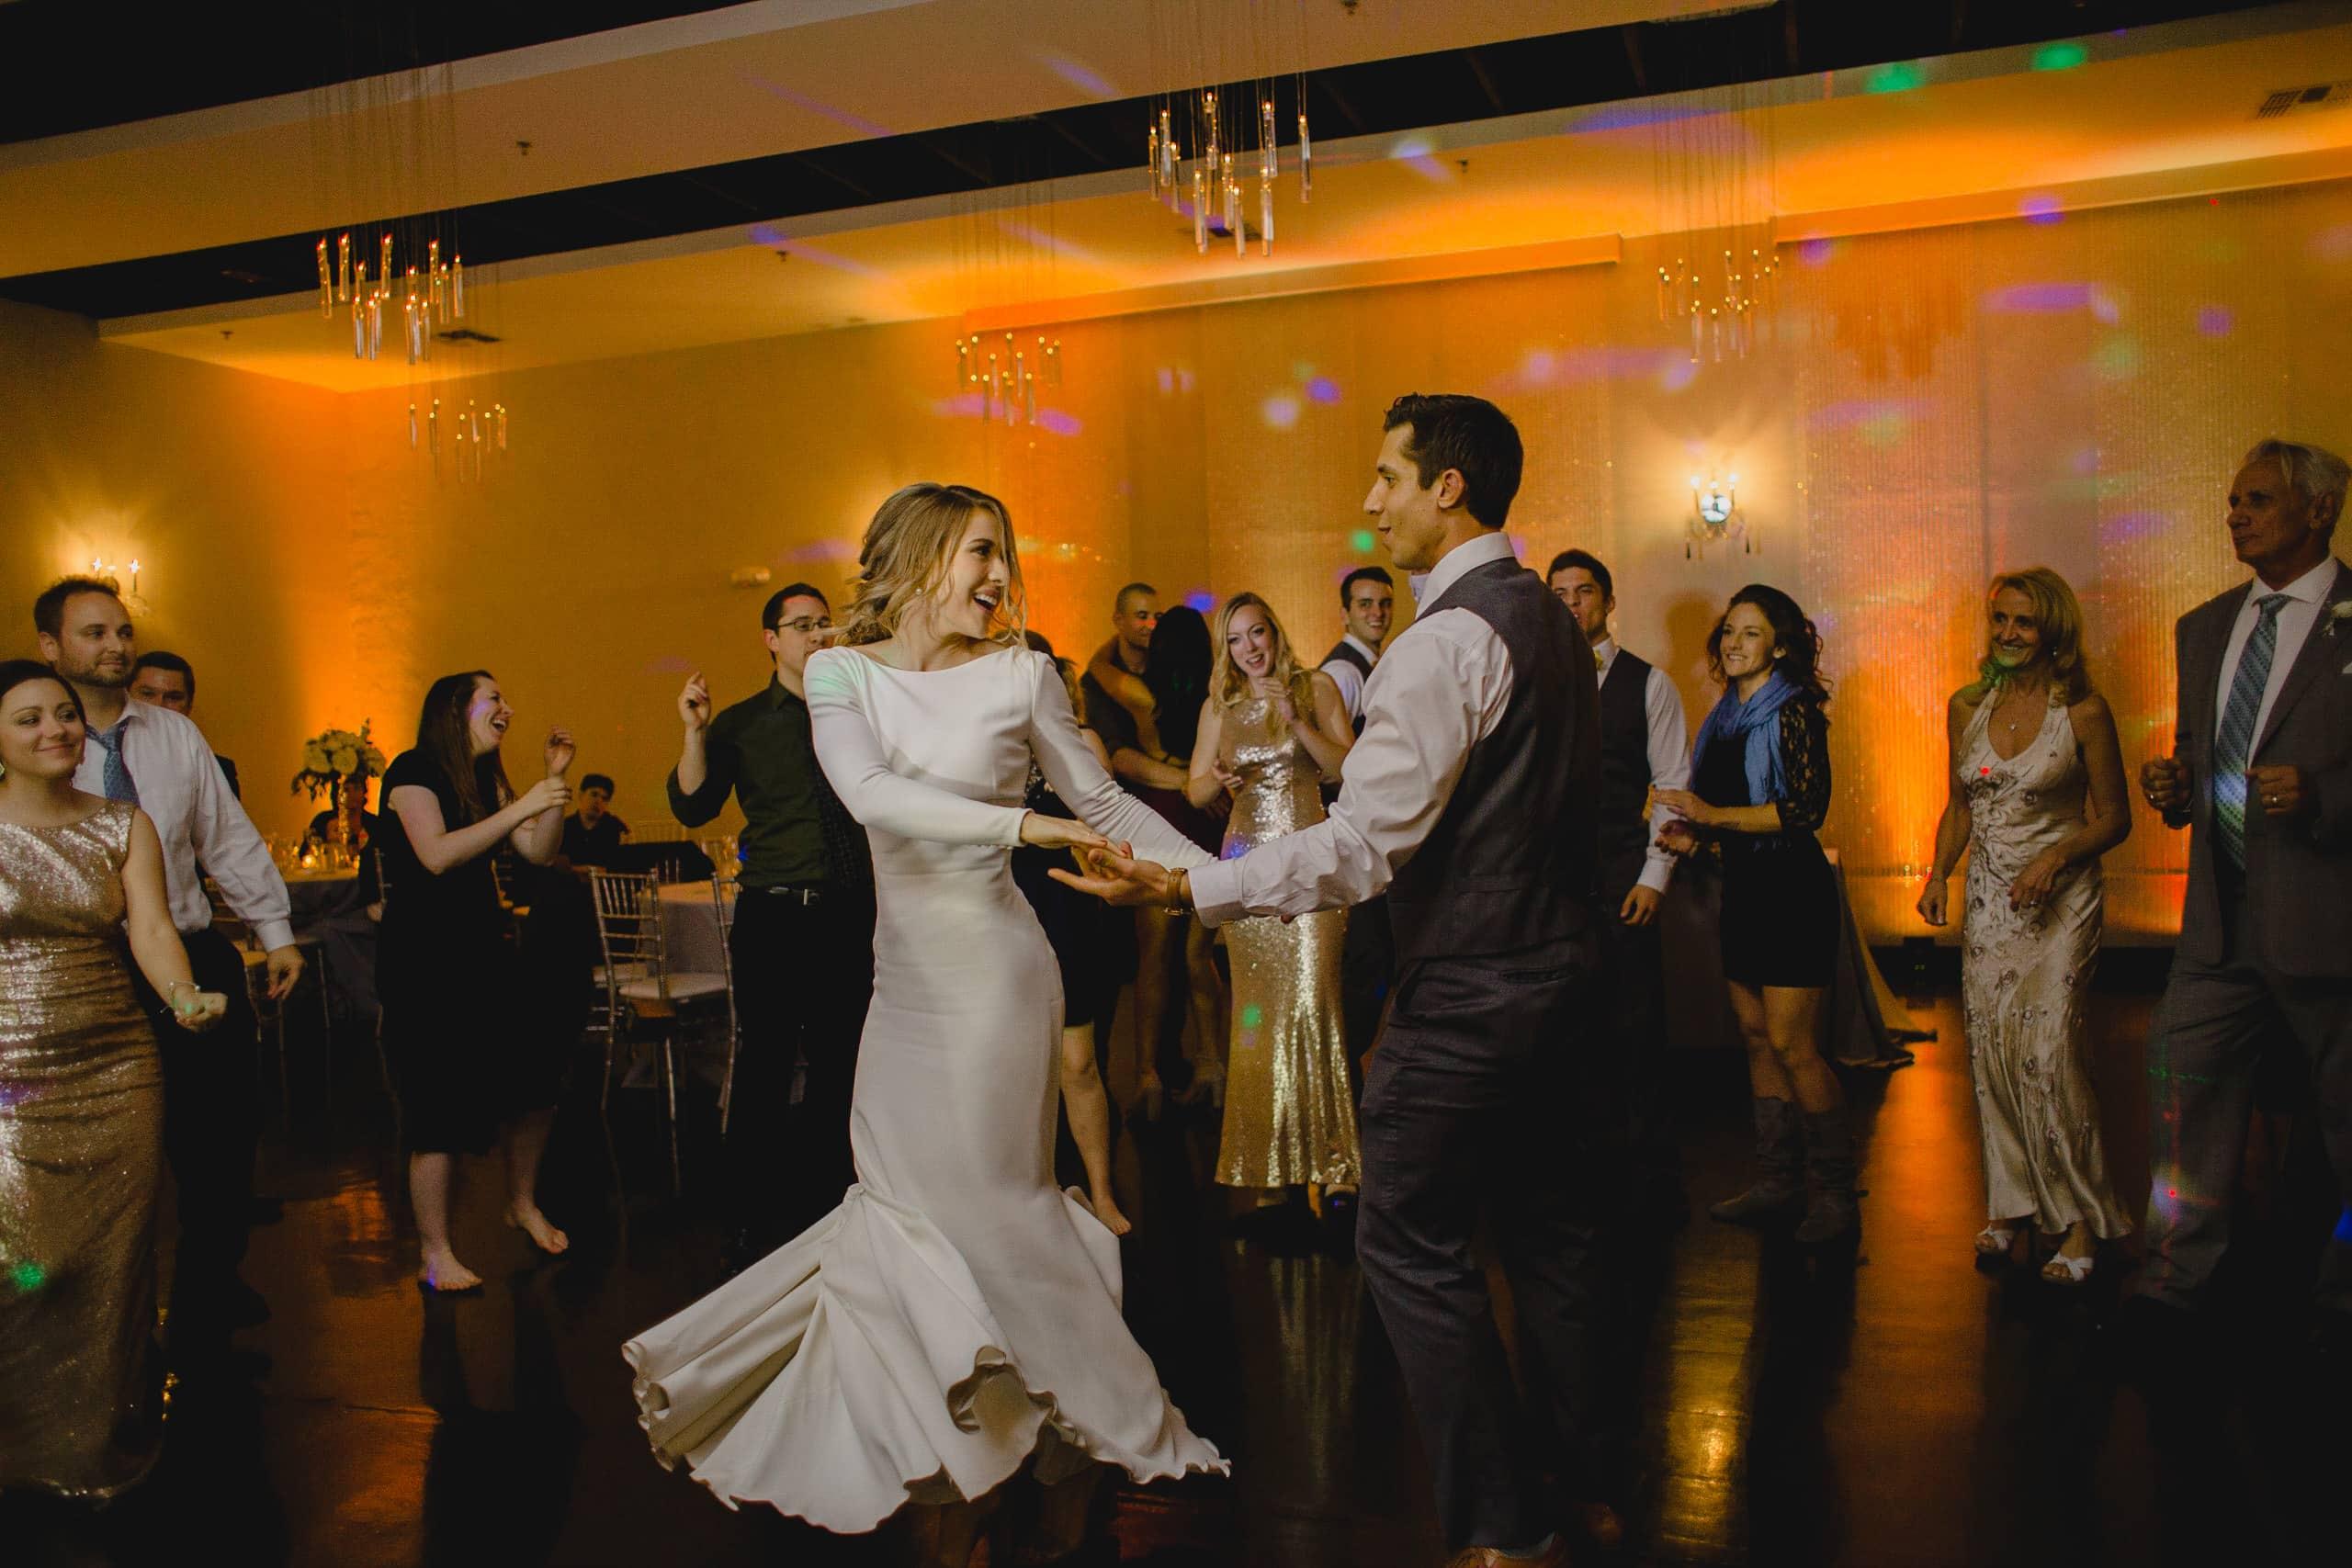 Soho63 wedding reception bride and groom dancing with amber uplighting